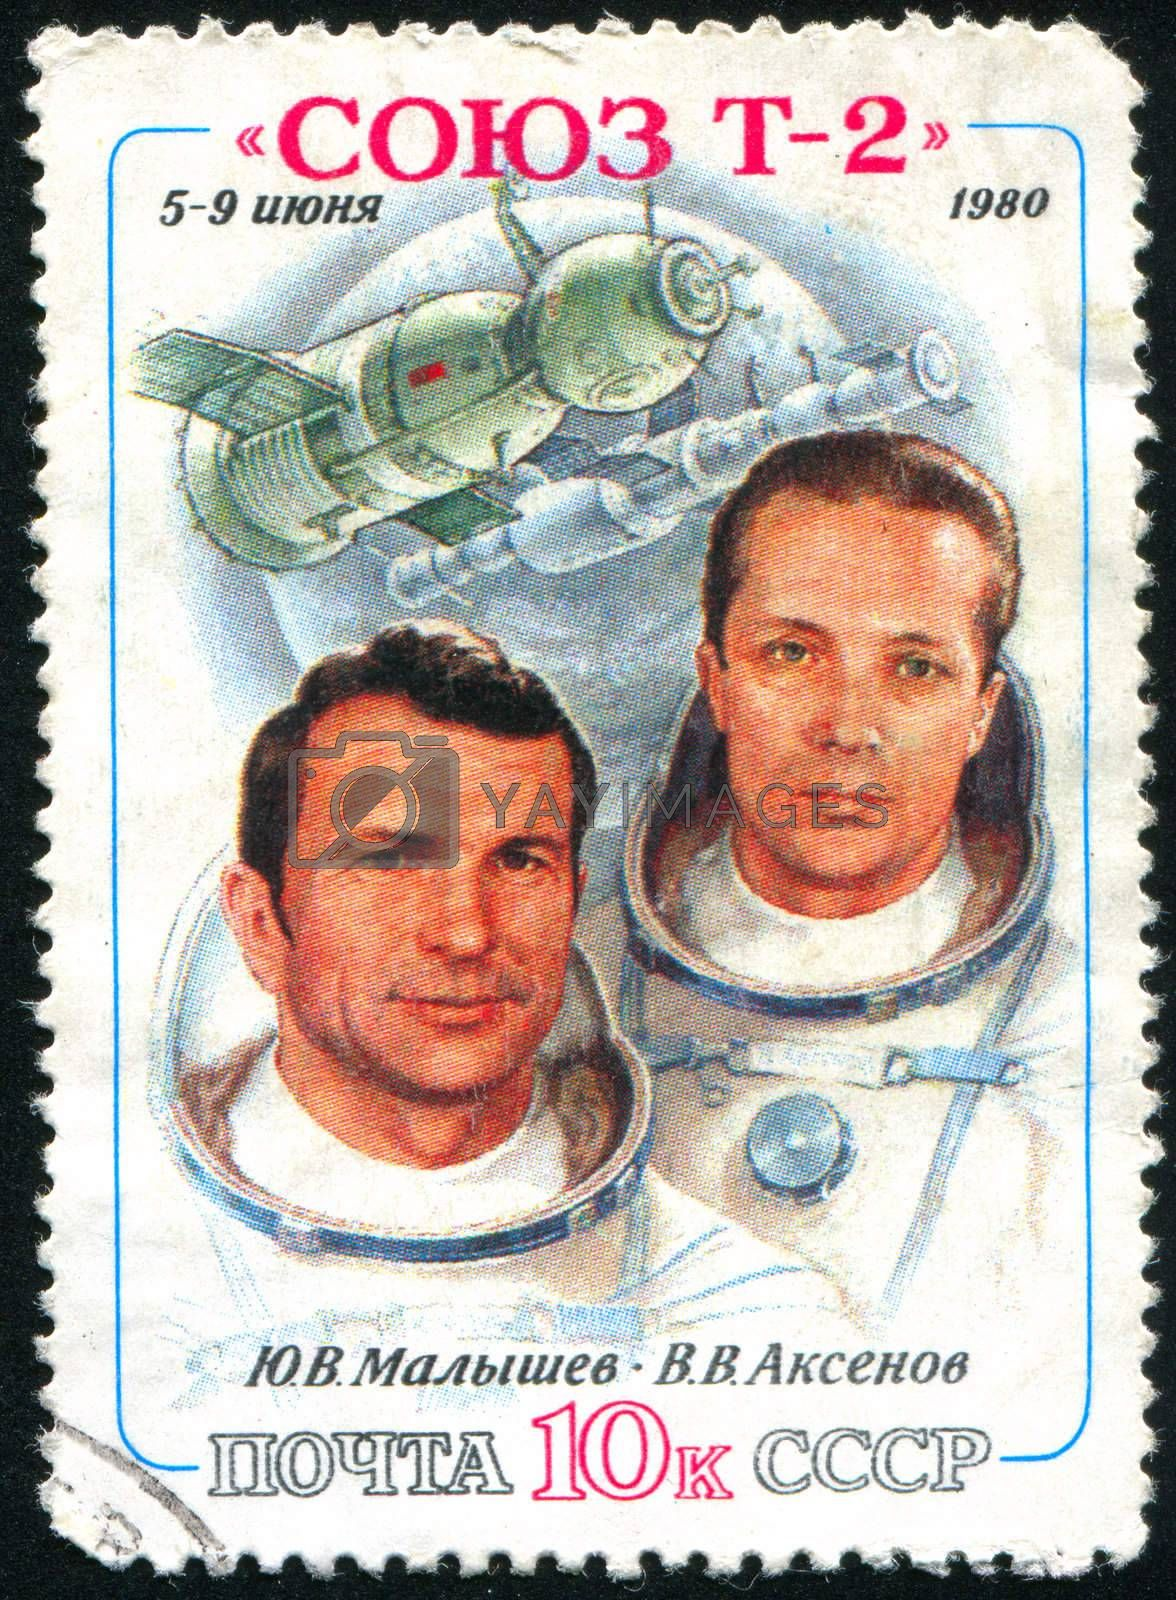 RUSSIA - CIRCA 1980: stamp printed by Russia, shows astronaut: Malyshev, Aksenov, circa 1980.